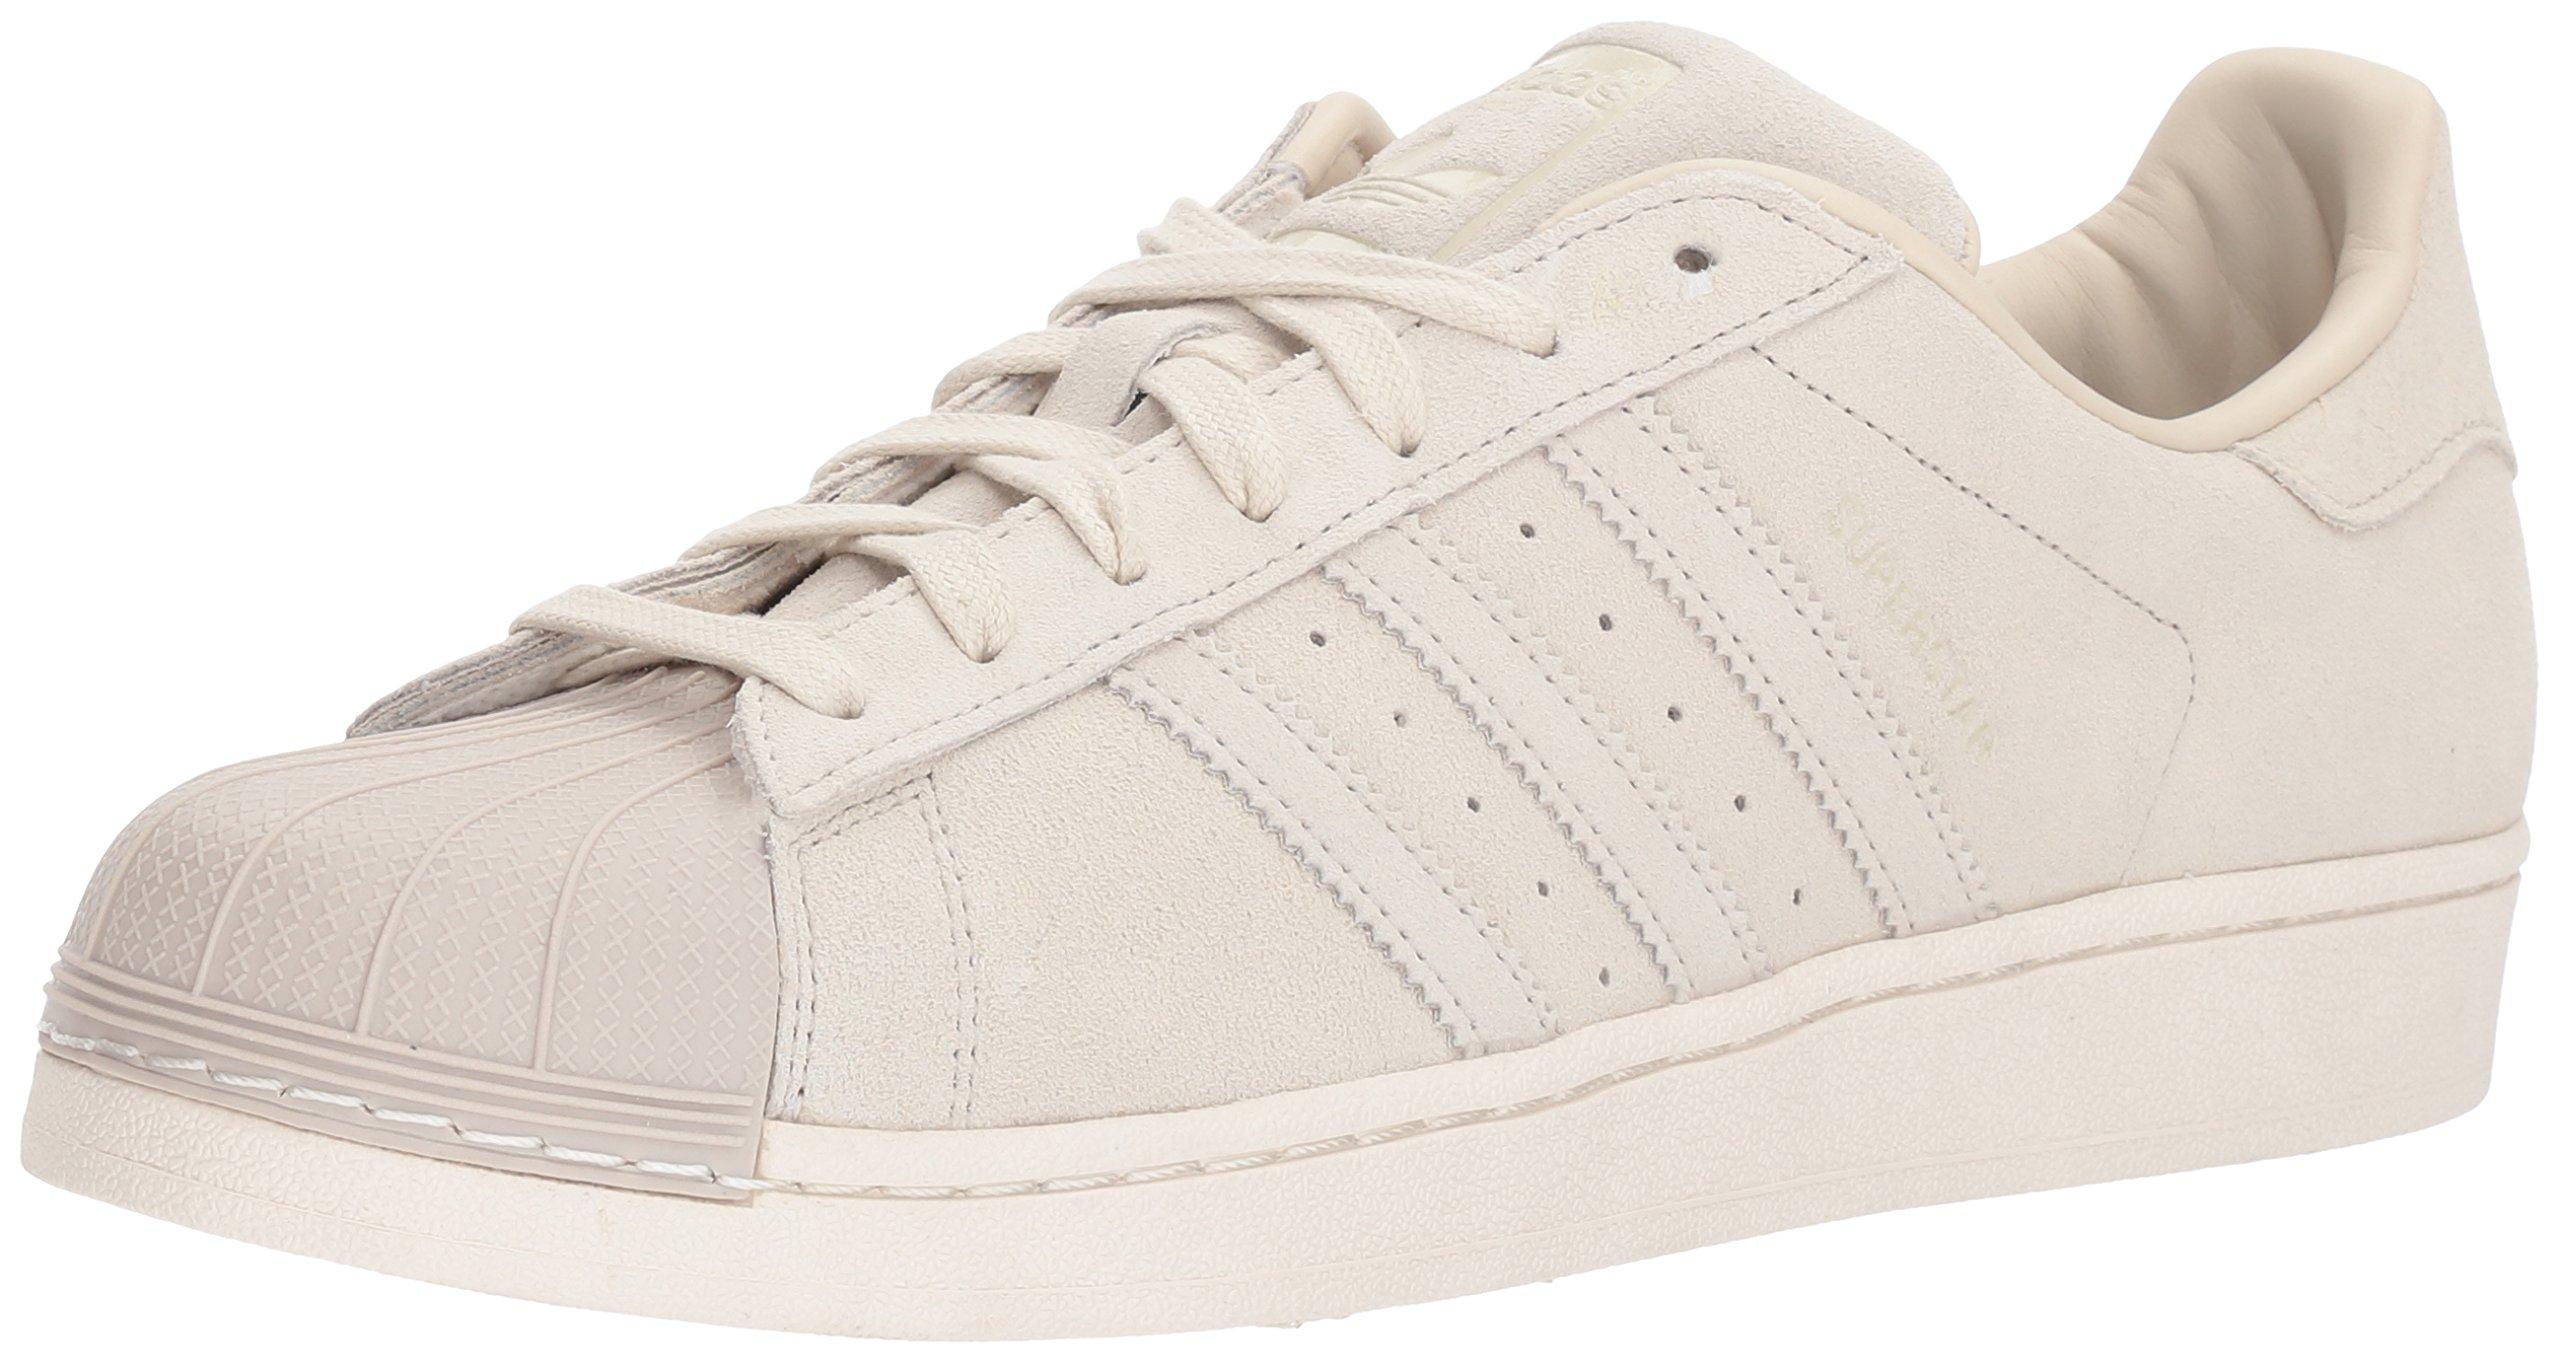 adidas Originals Men's Superstar Foundation Casual Sneaker, Clear Brown/Clear Brown/Clear Brown, 4 D(M) US